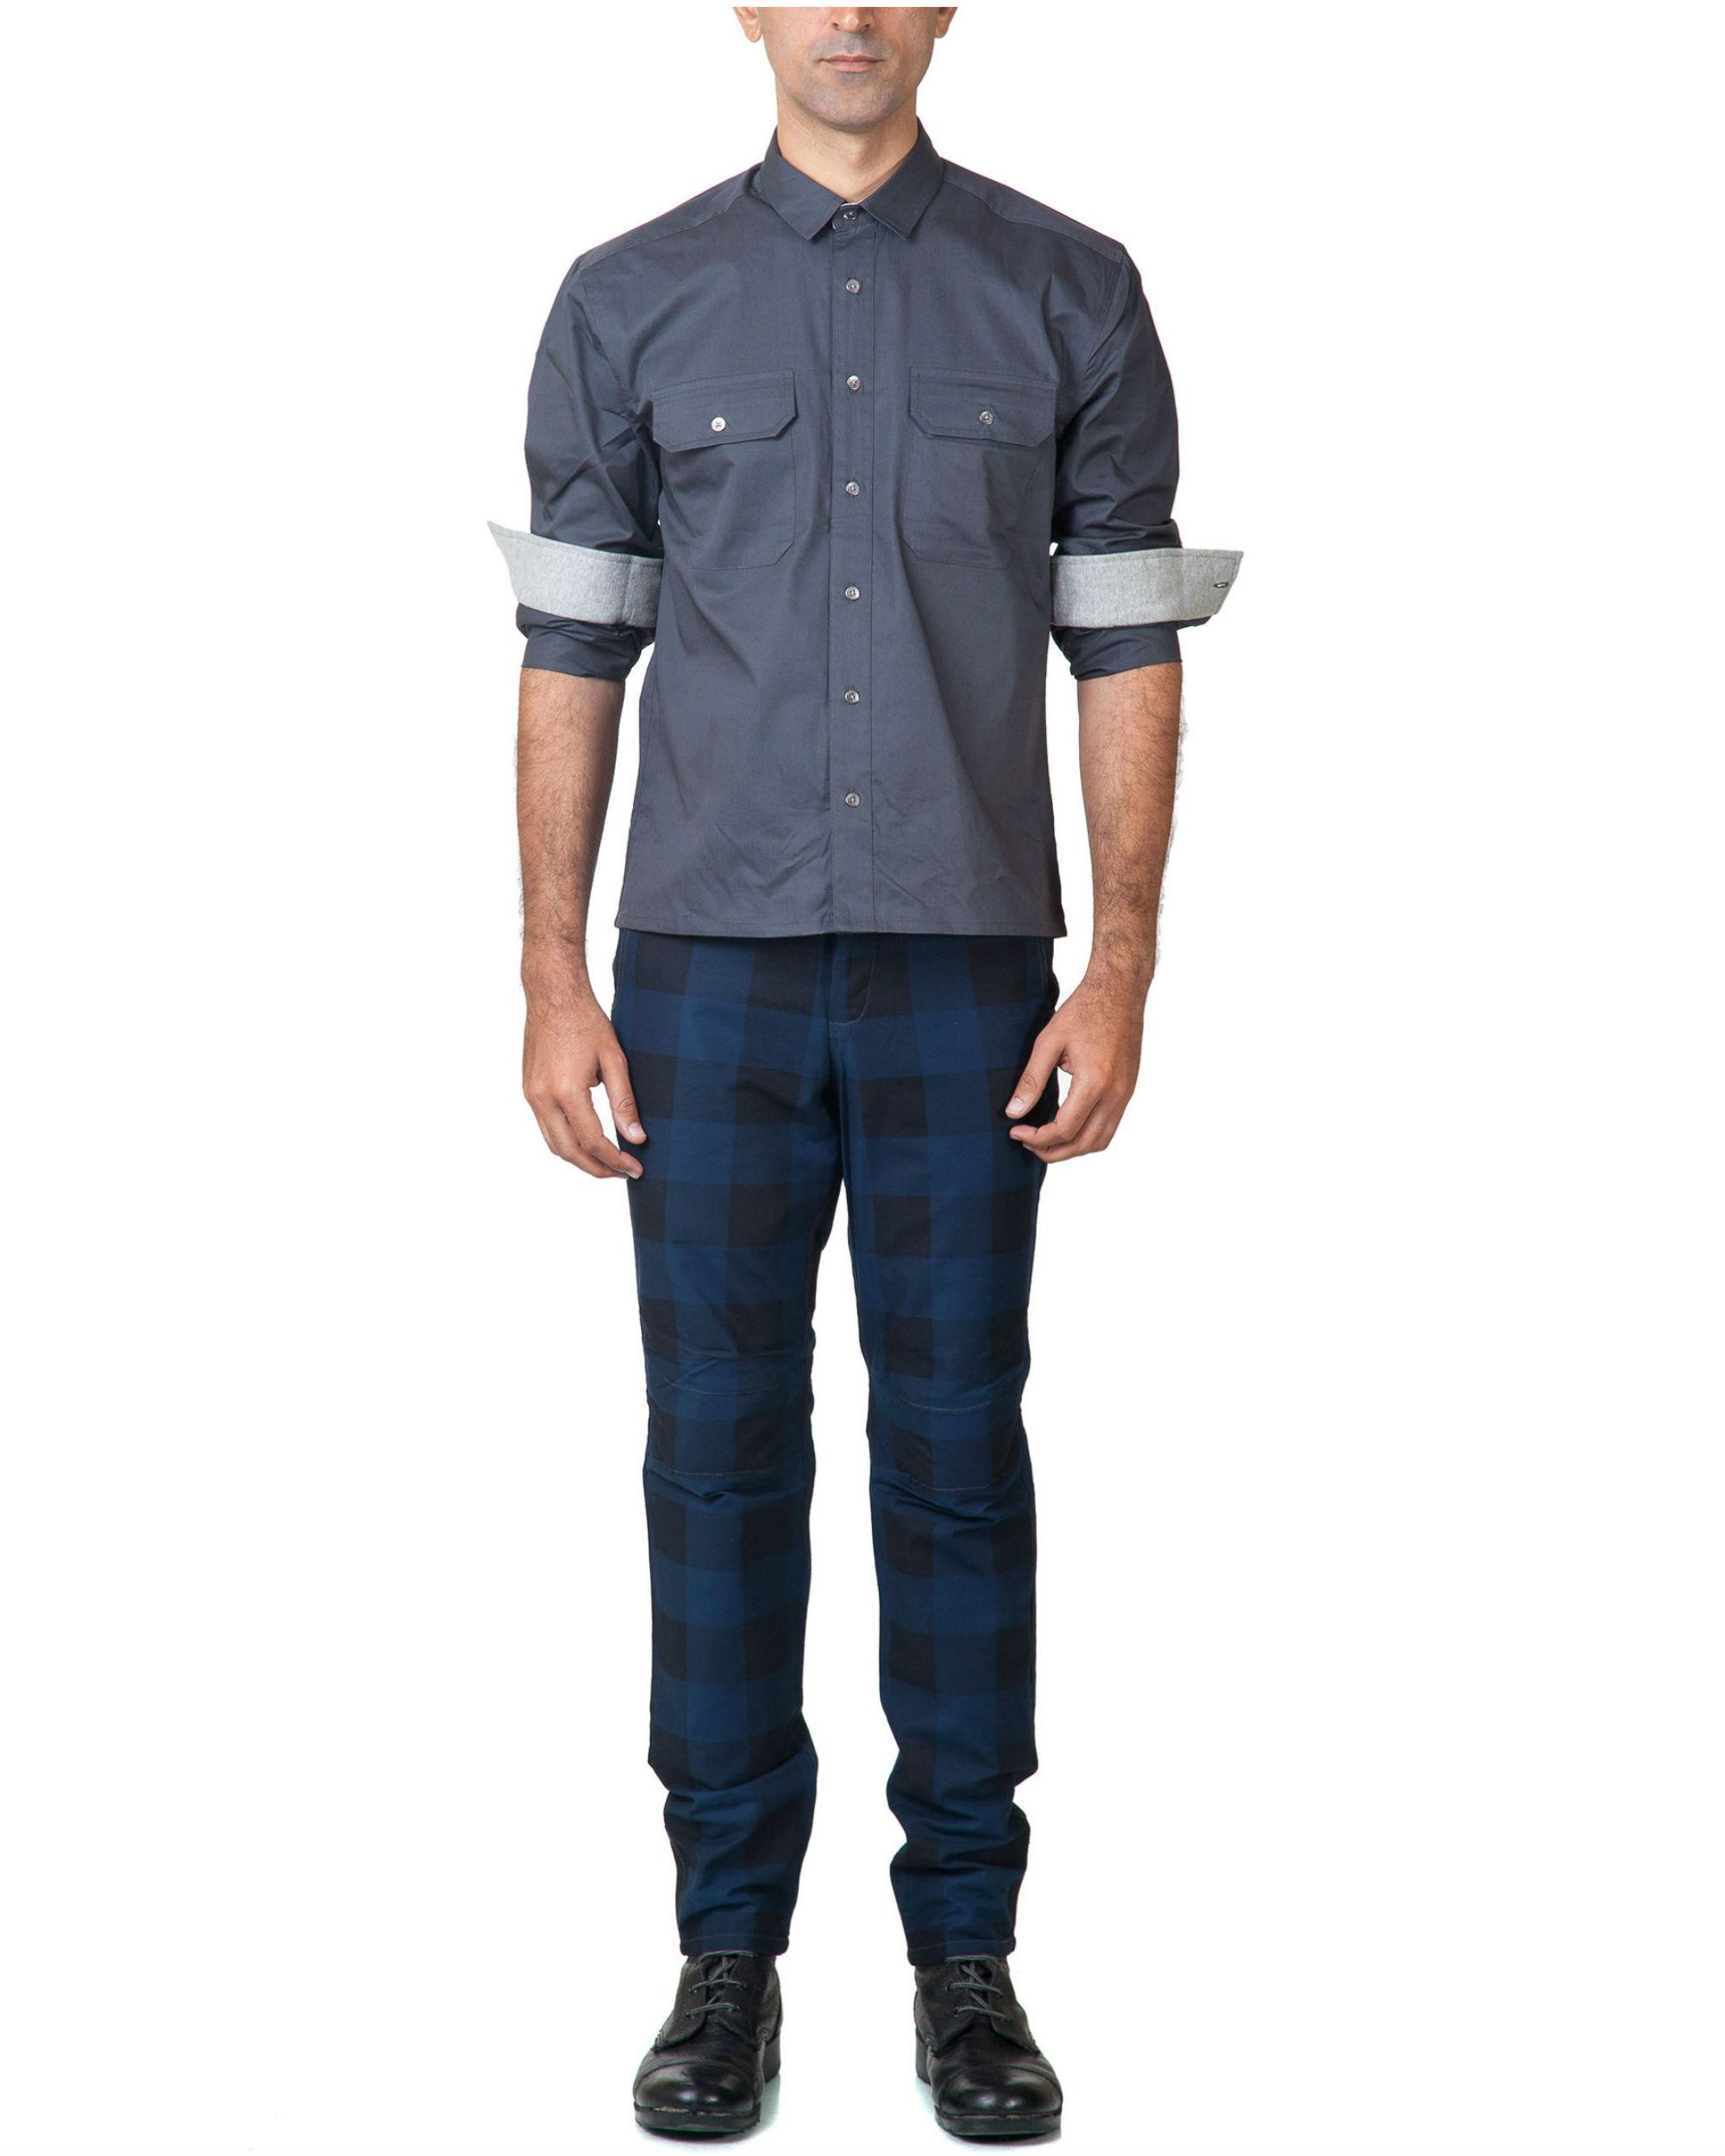 Blue utility trouser